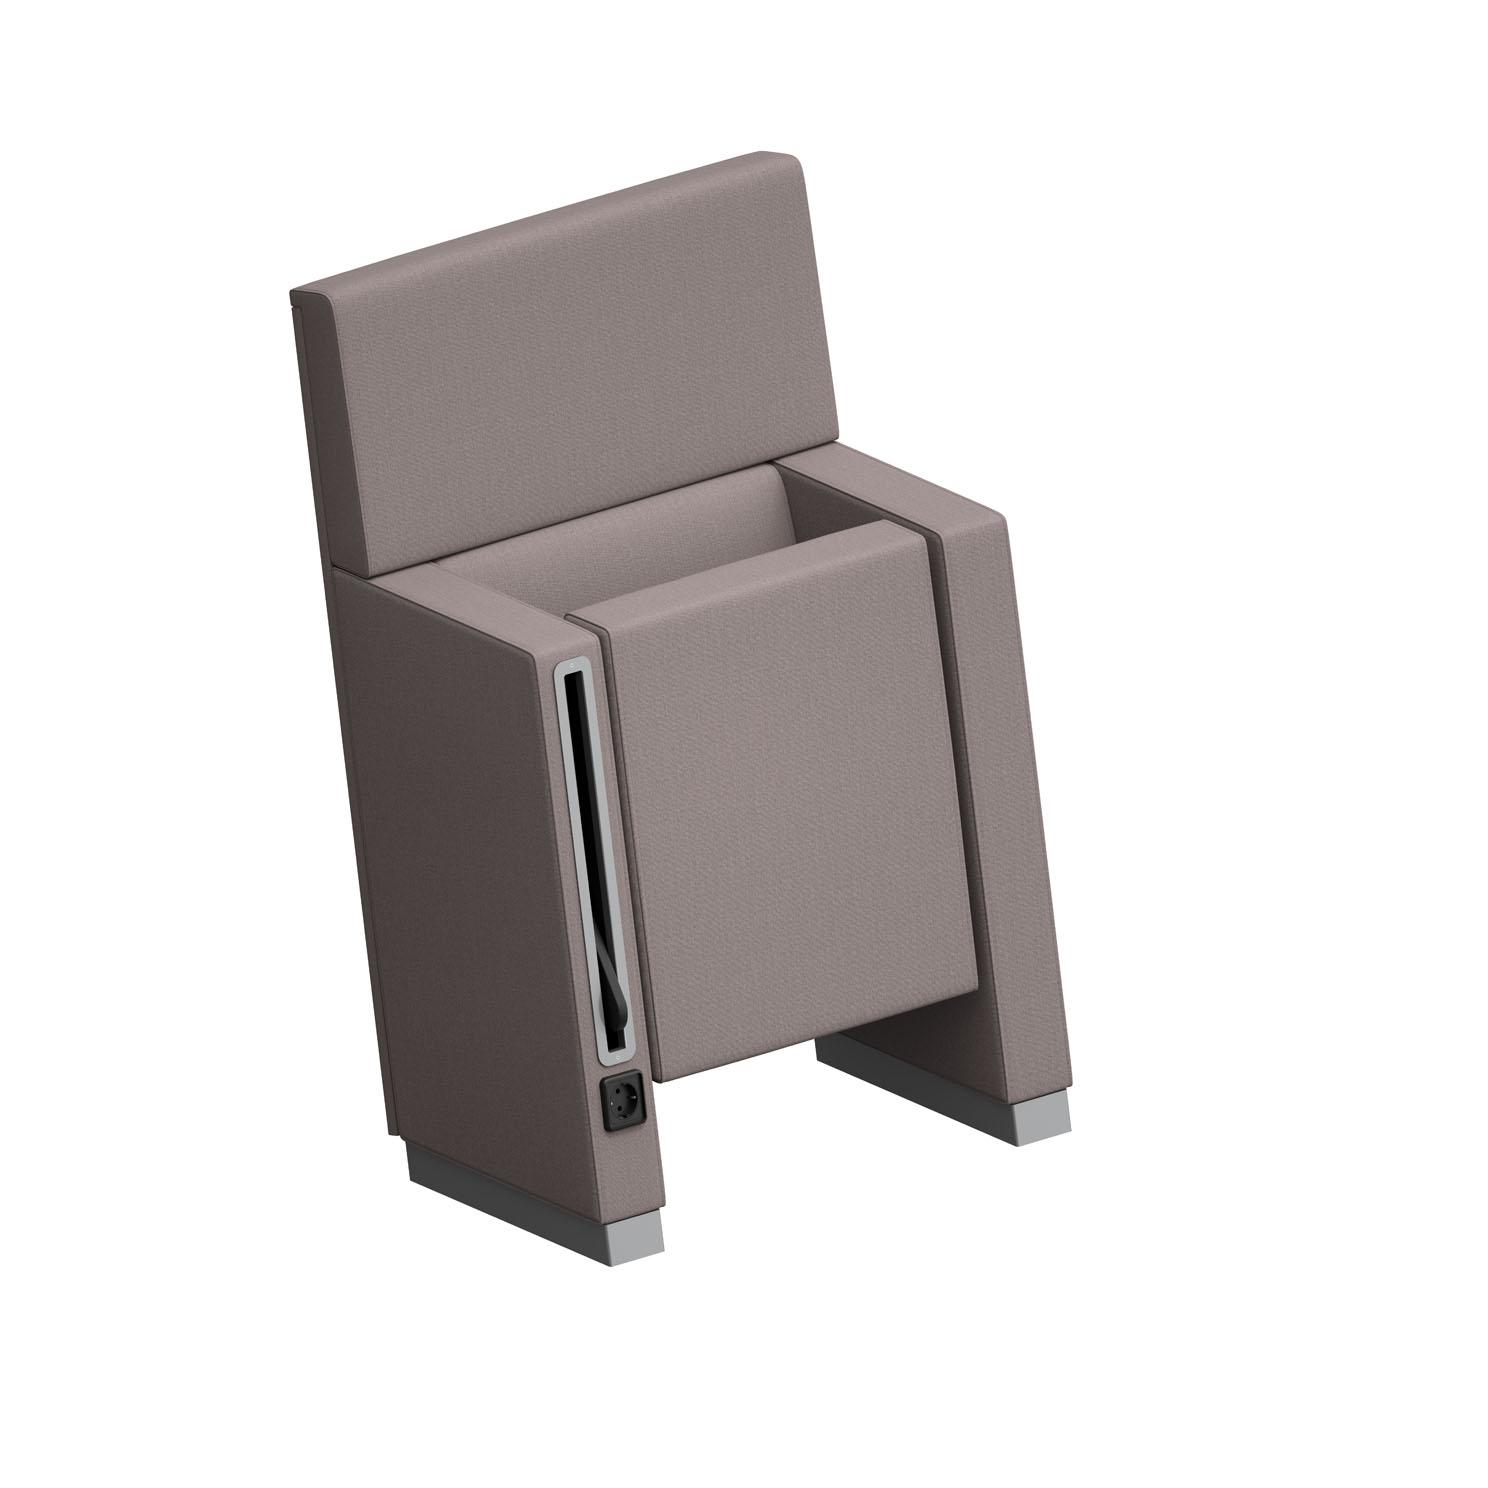 LAMM L213 Chair | Woodwood Group